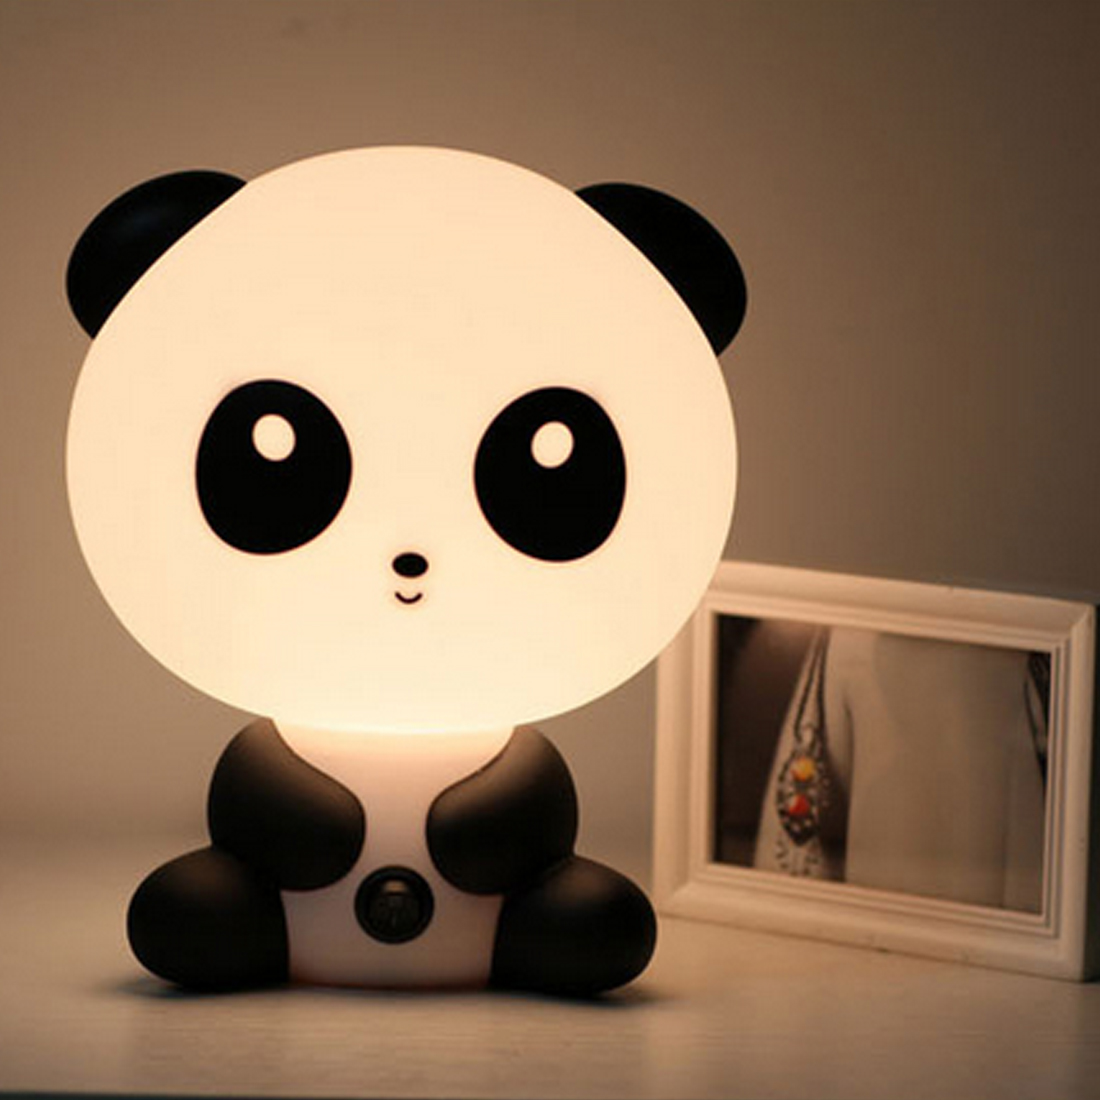 EU Plug Baby Bedroom Lamps Night Light Cartoon Pets Rabbit Panda PVC Plastic Sleep Led Kid Lamp Bulb Nightlight for Kids